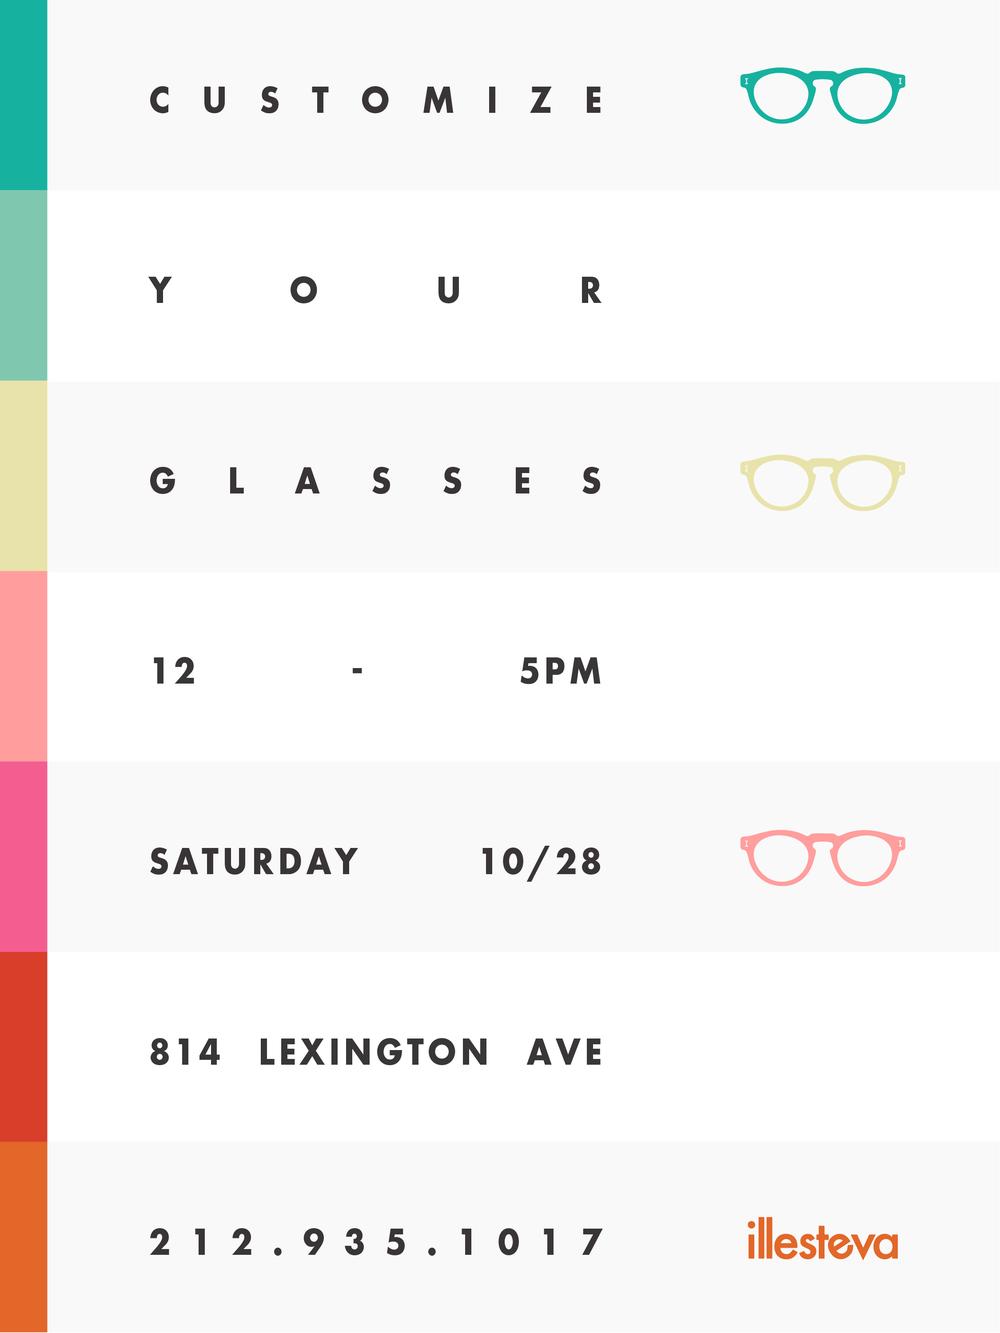 Design your Own - Customization event at Illesteva Lexington